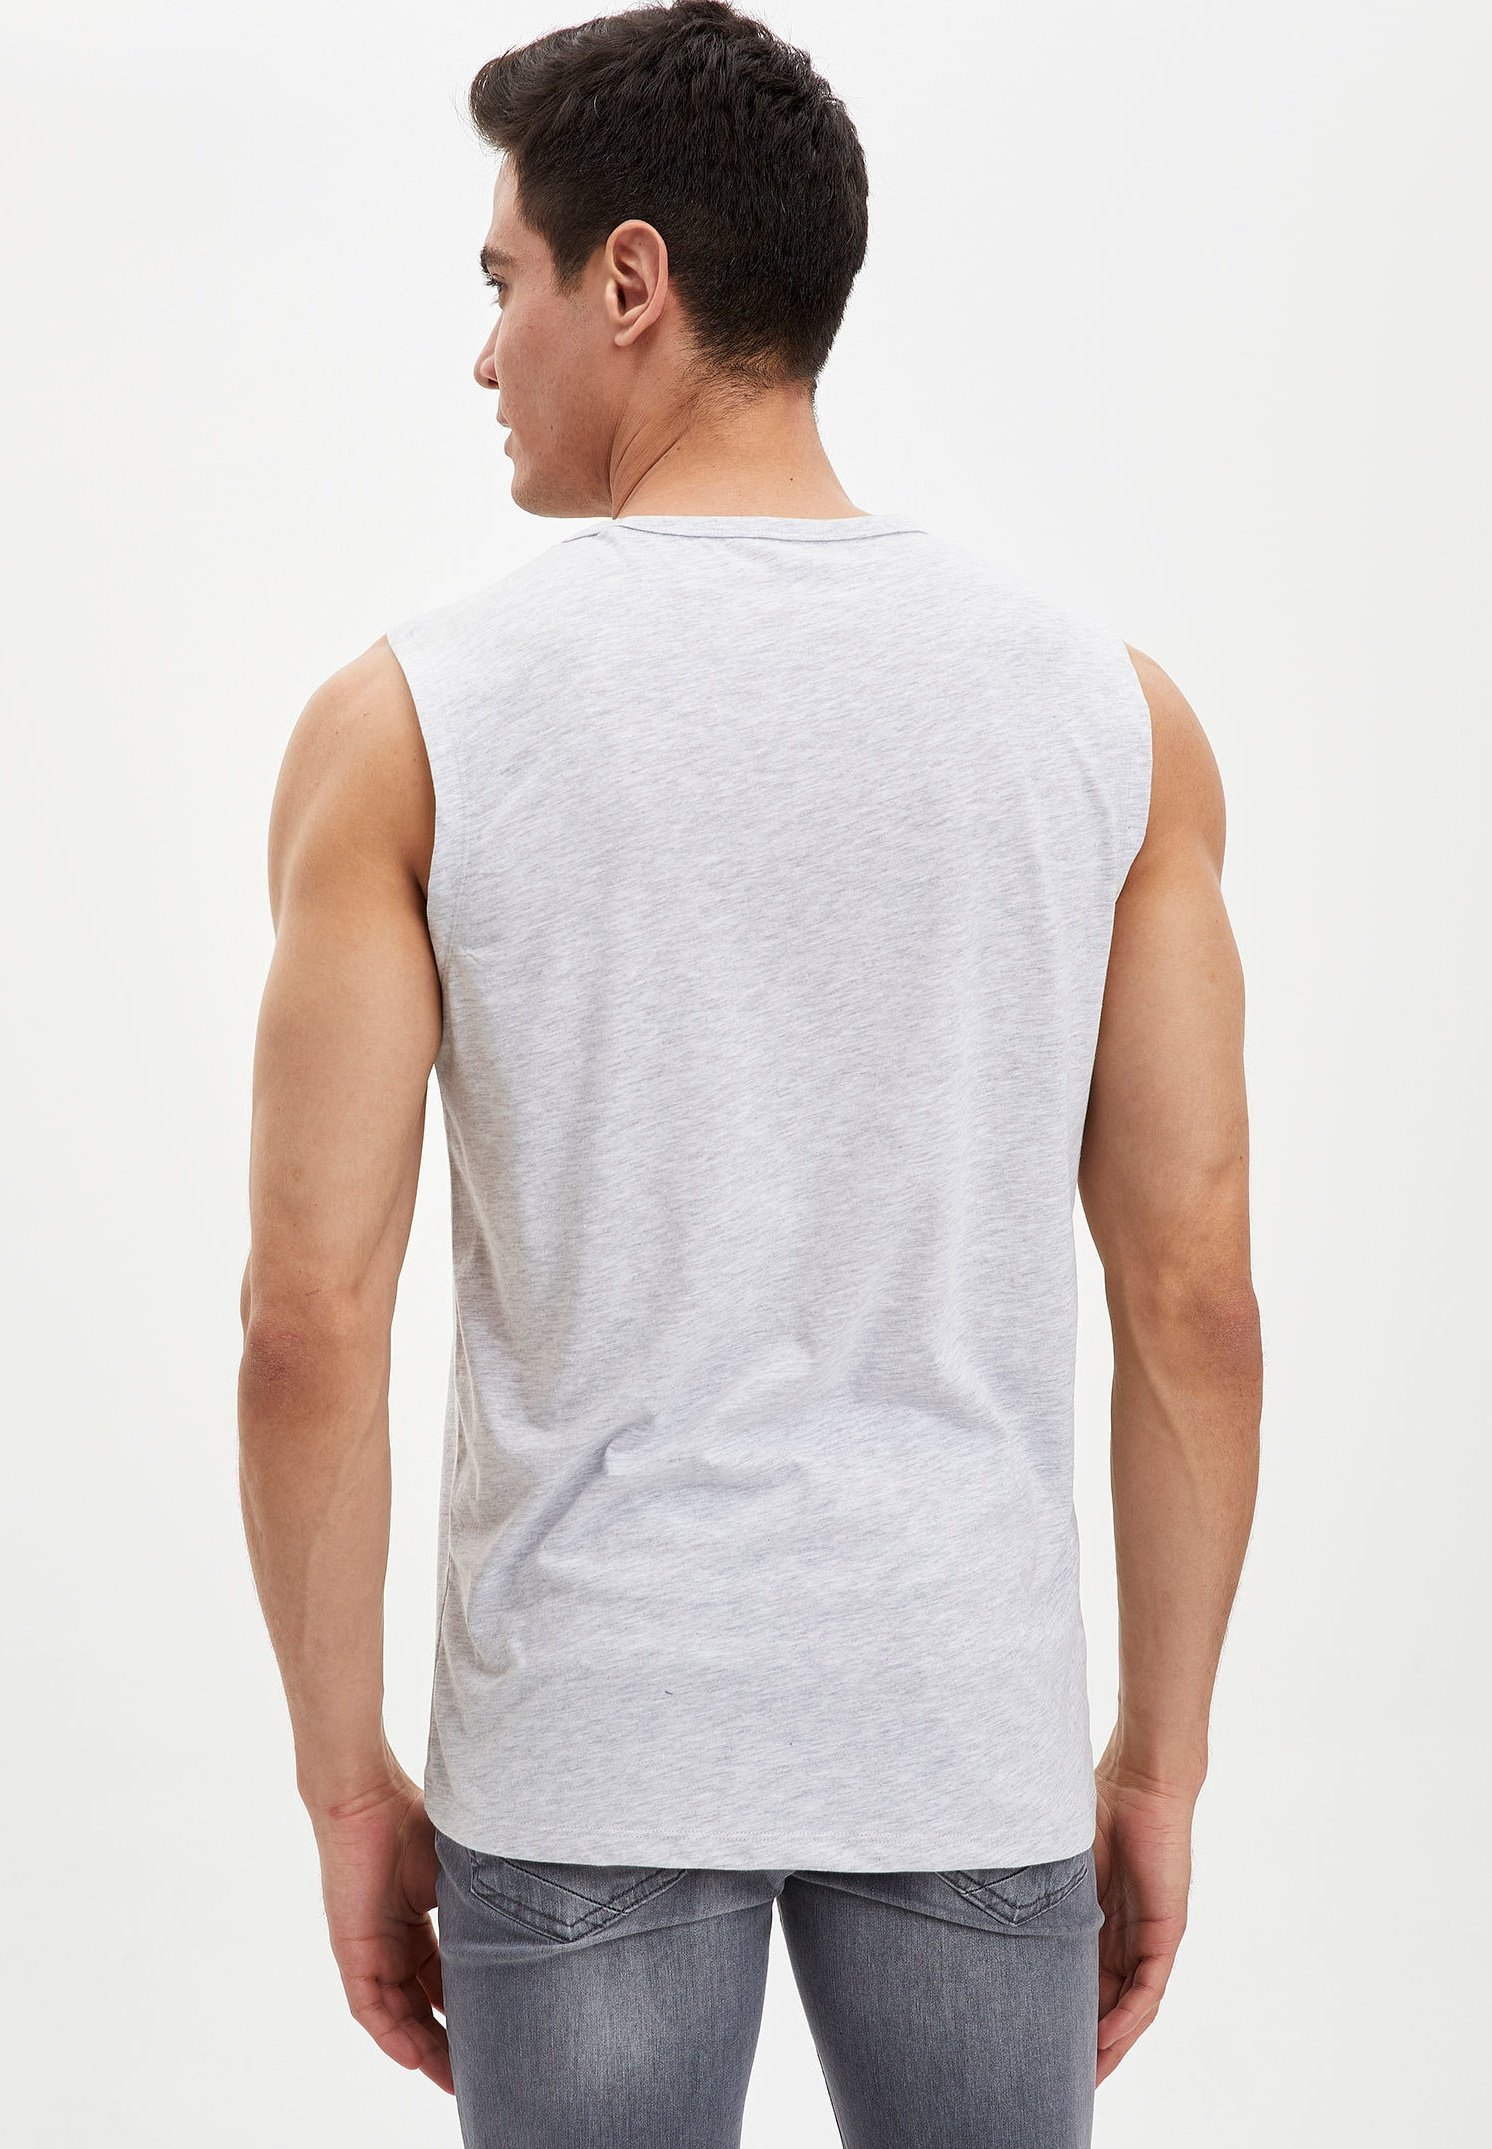 Nike Sportswear TEE JUST DO IT - T-shirt med print - white/limelight/cerulean/vit - Herrkläder me2Wr